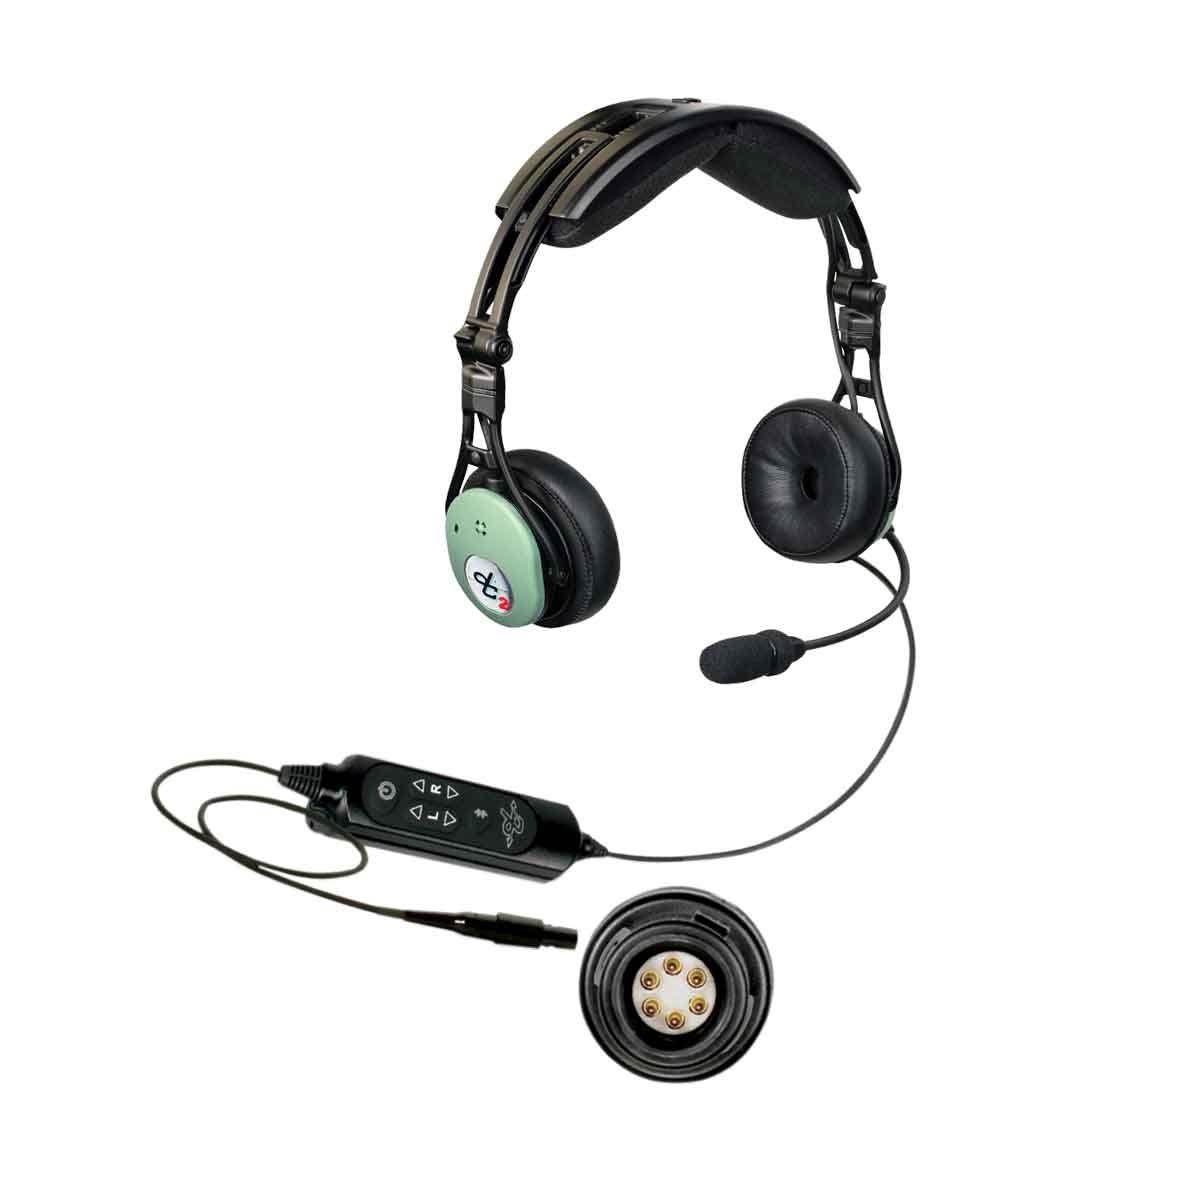 david clark pro x headset review